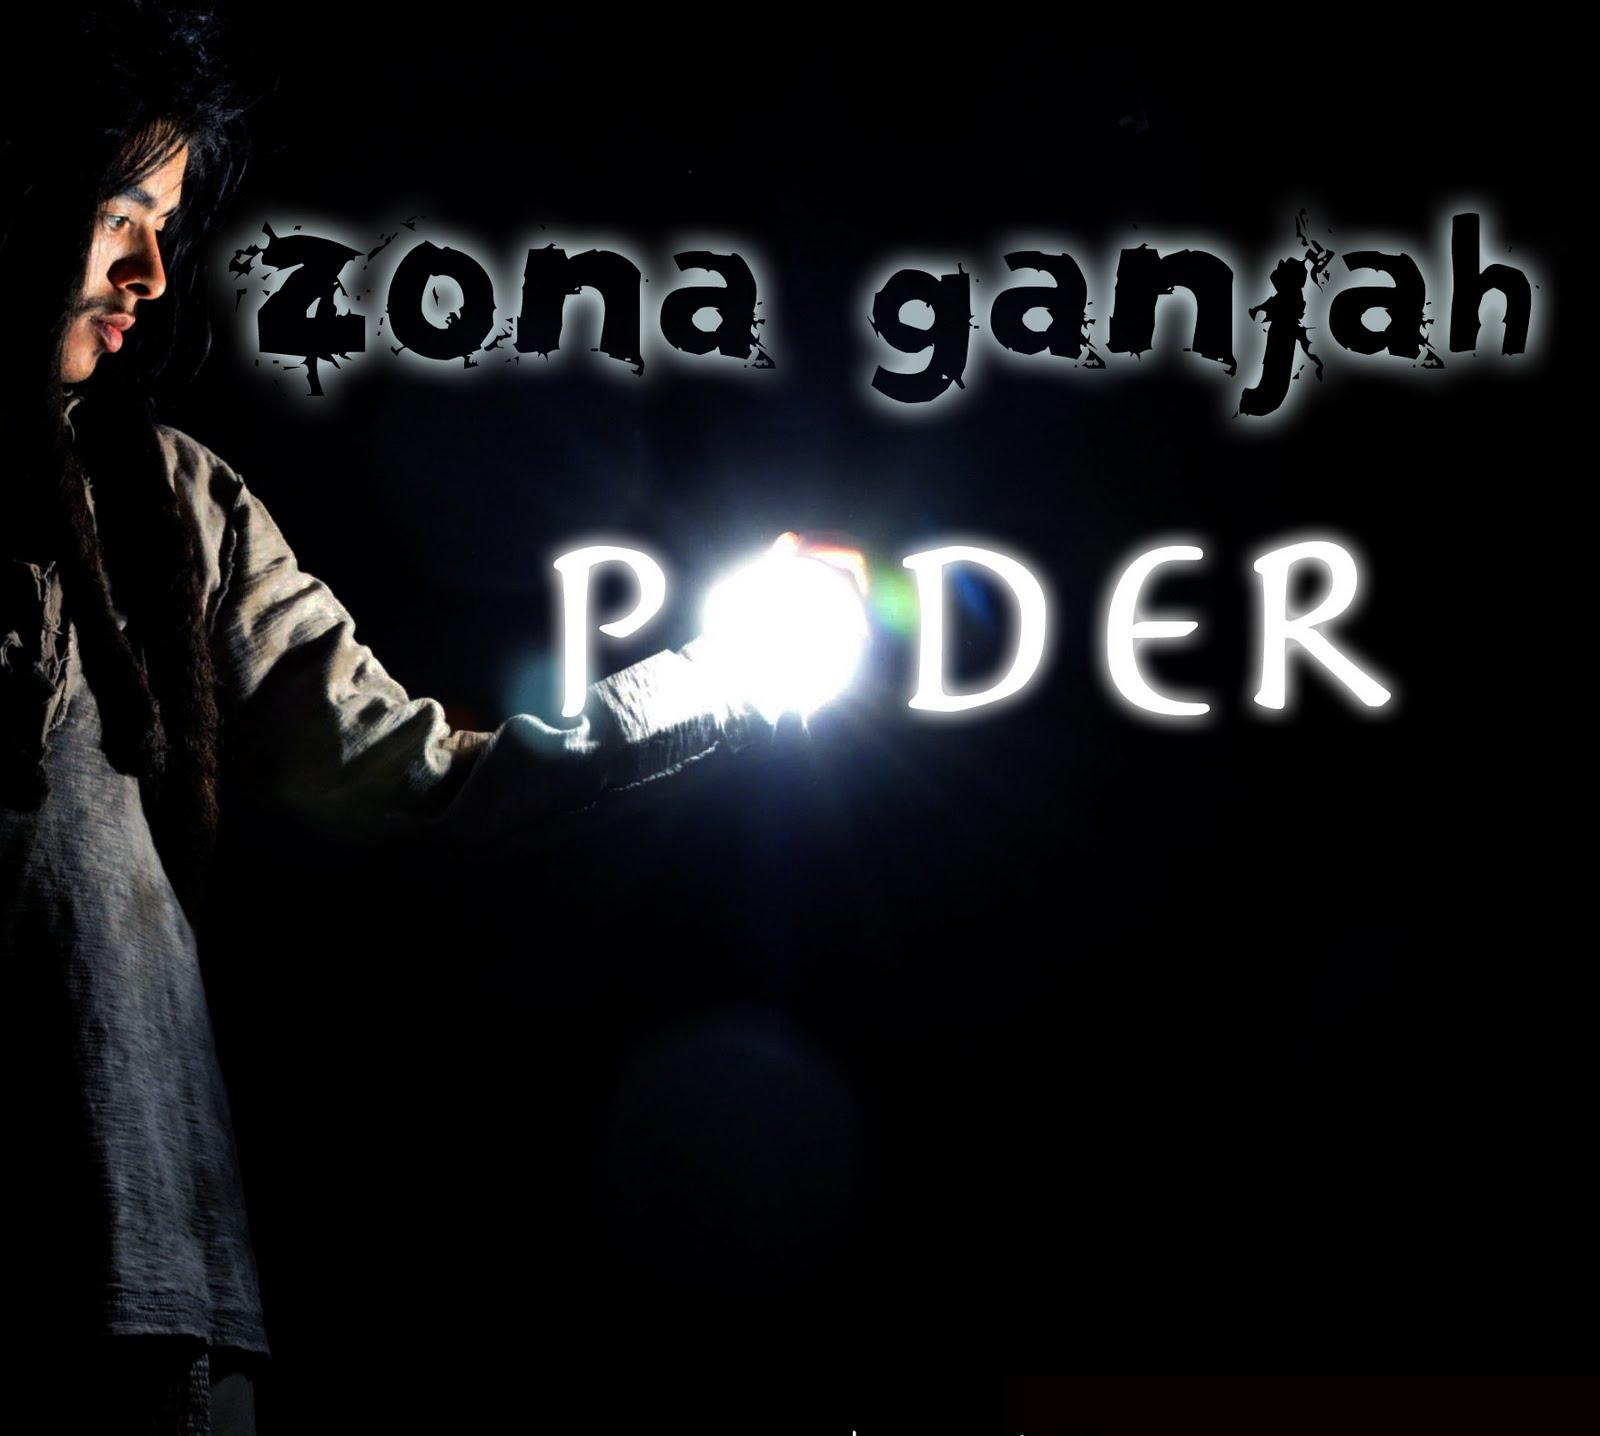 http://2.bp.blogspot.com/_FbLe4B25ZkA/S99VE2jFkzI/AAAAAAAAArc/pTgyc5YSMdw/s1600/adelanto+poder+2010.jpg